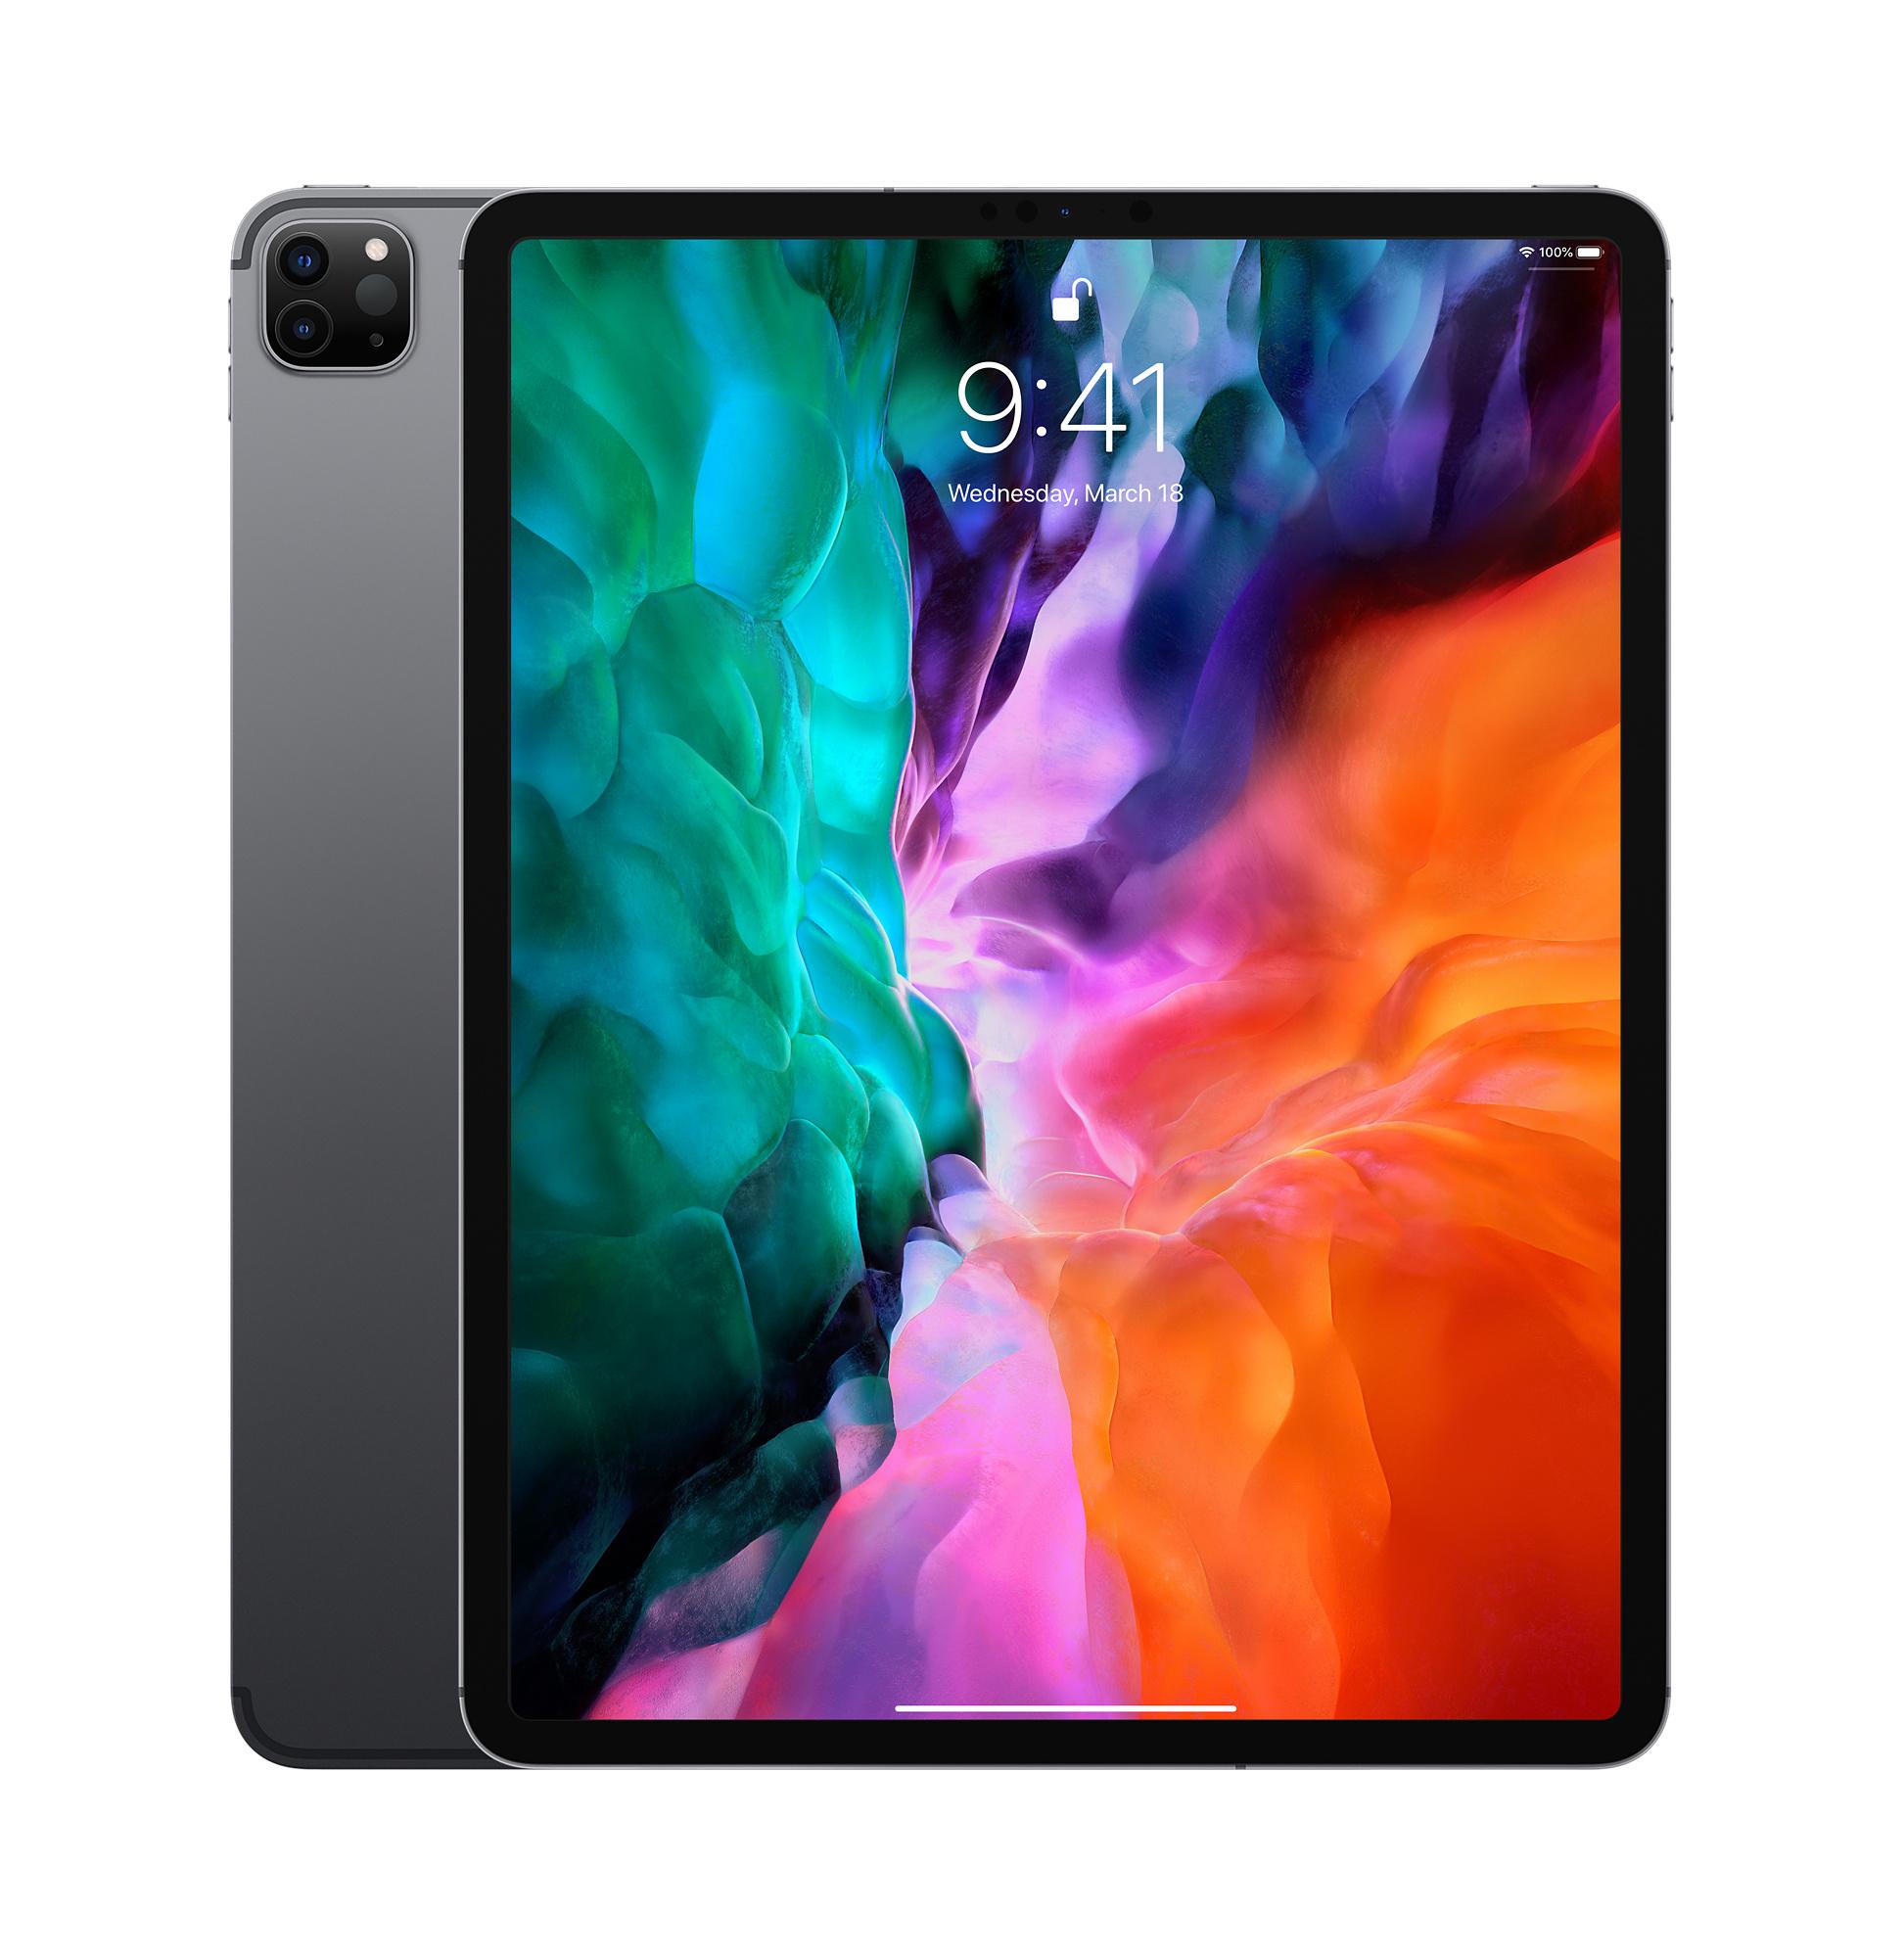 12 9 Inch Ipad Pro Wi Fi Cellular 256gb Space Gray Apple